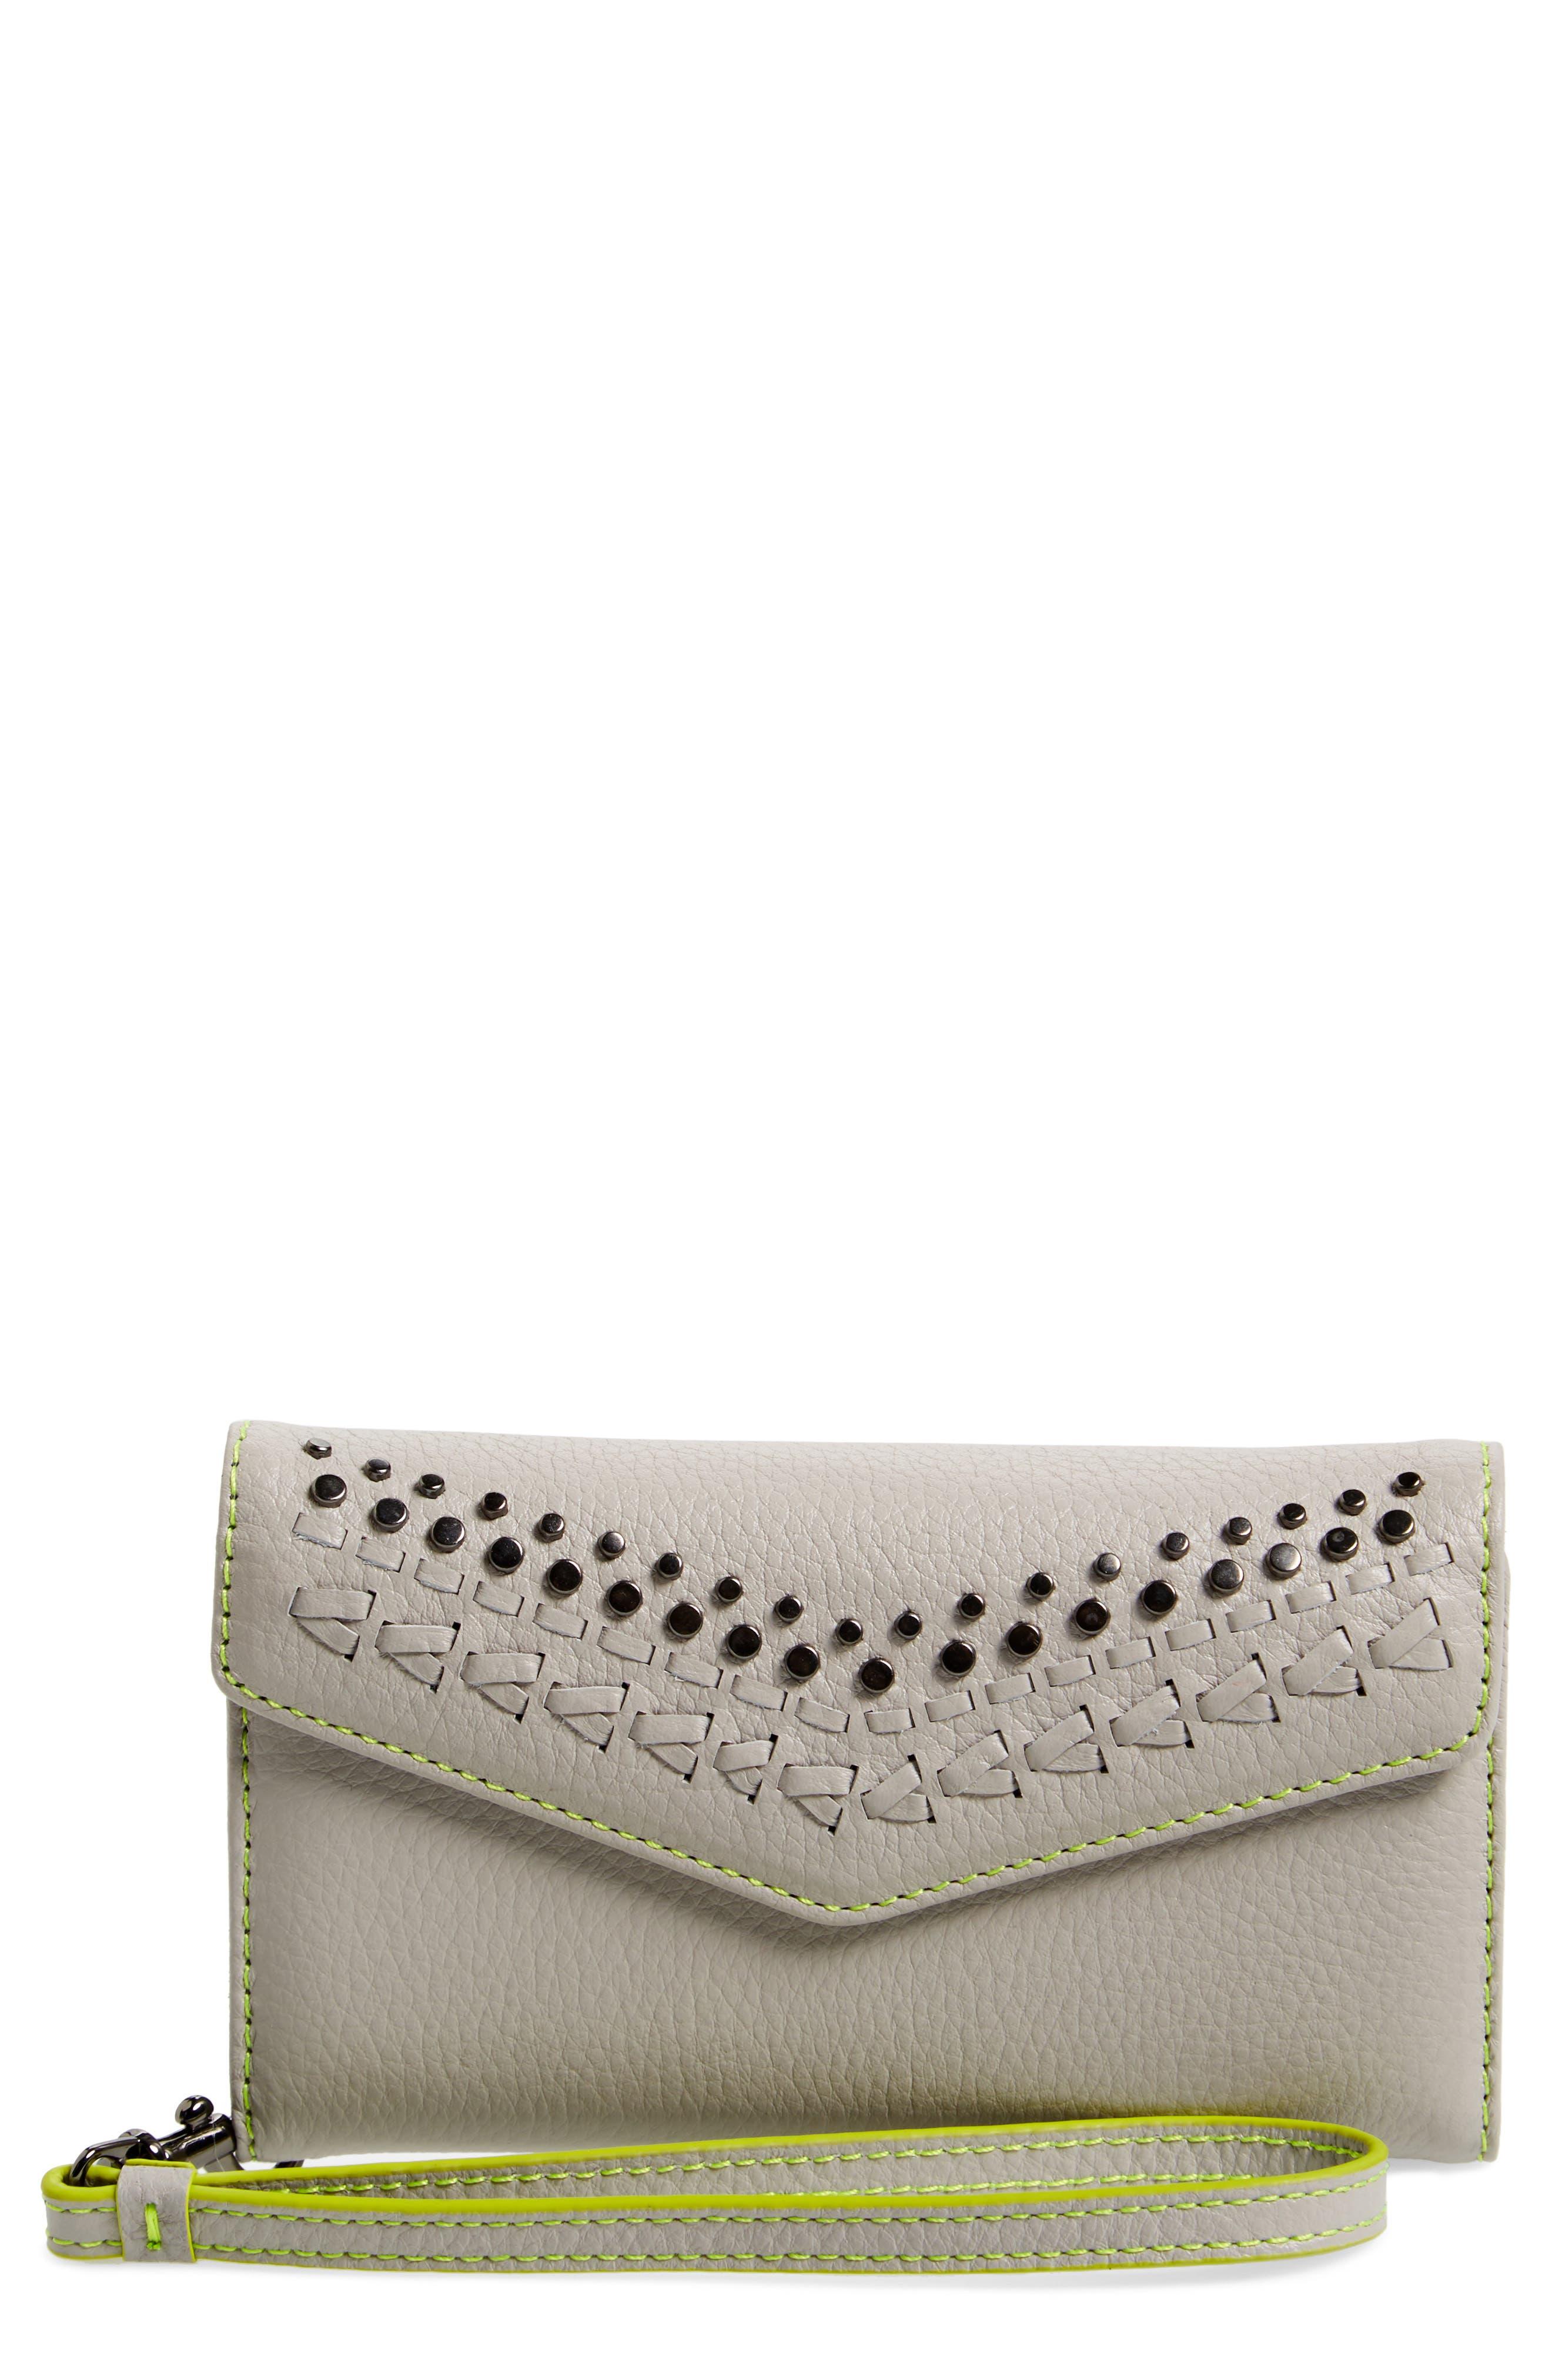 Rebecca Minkoff Studded Leather iPhone 7/8 Wristlet